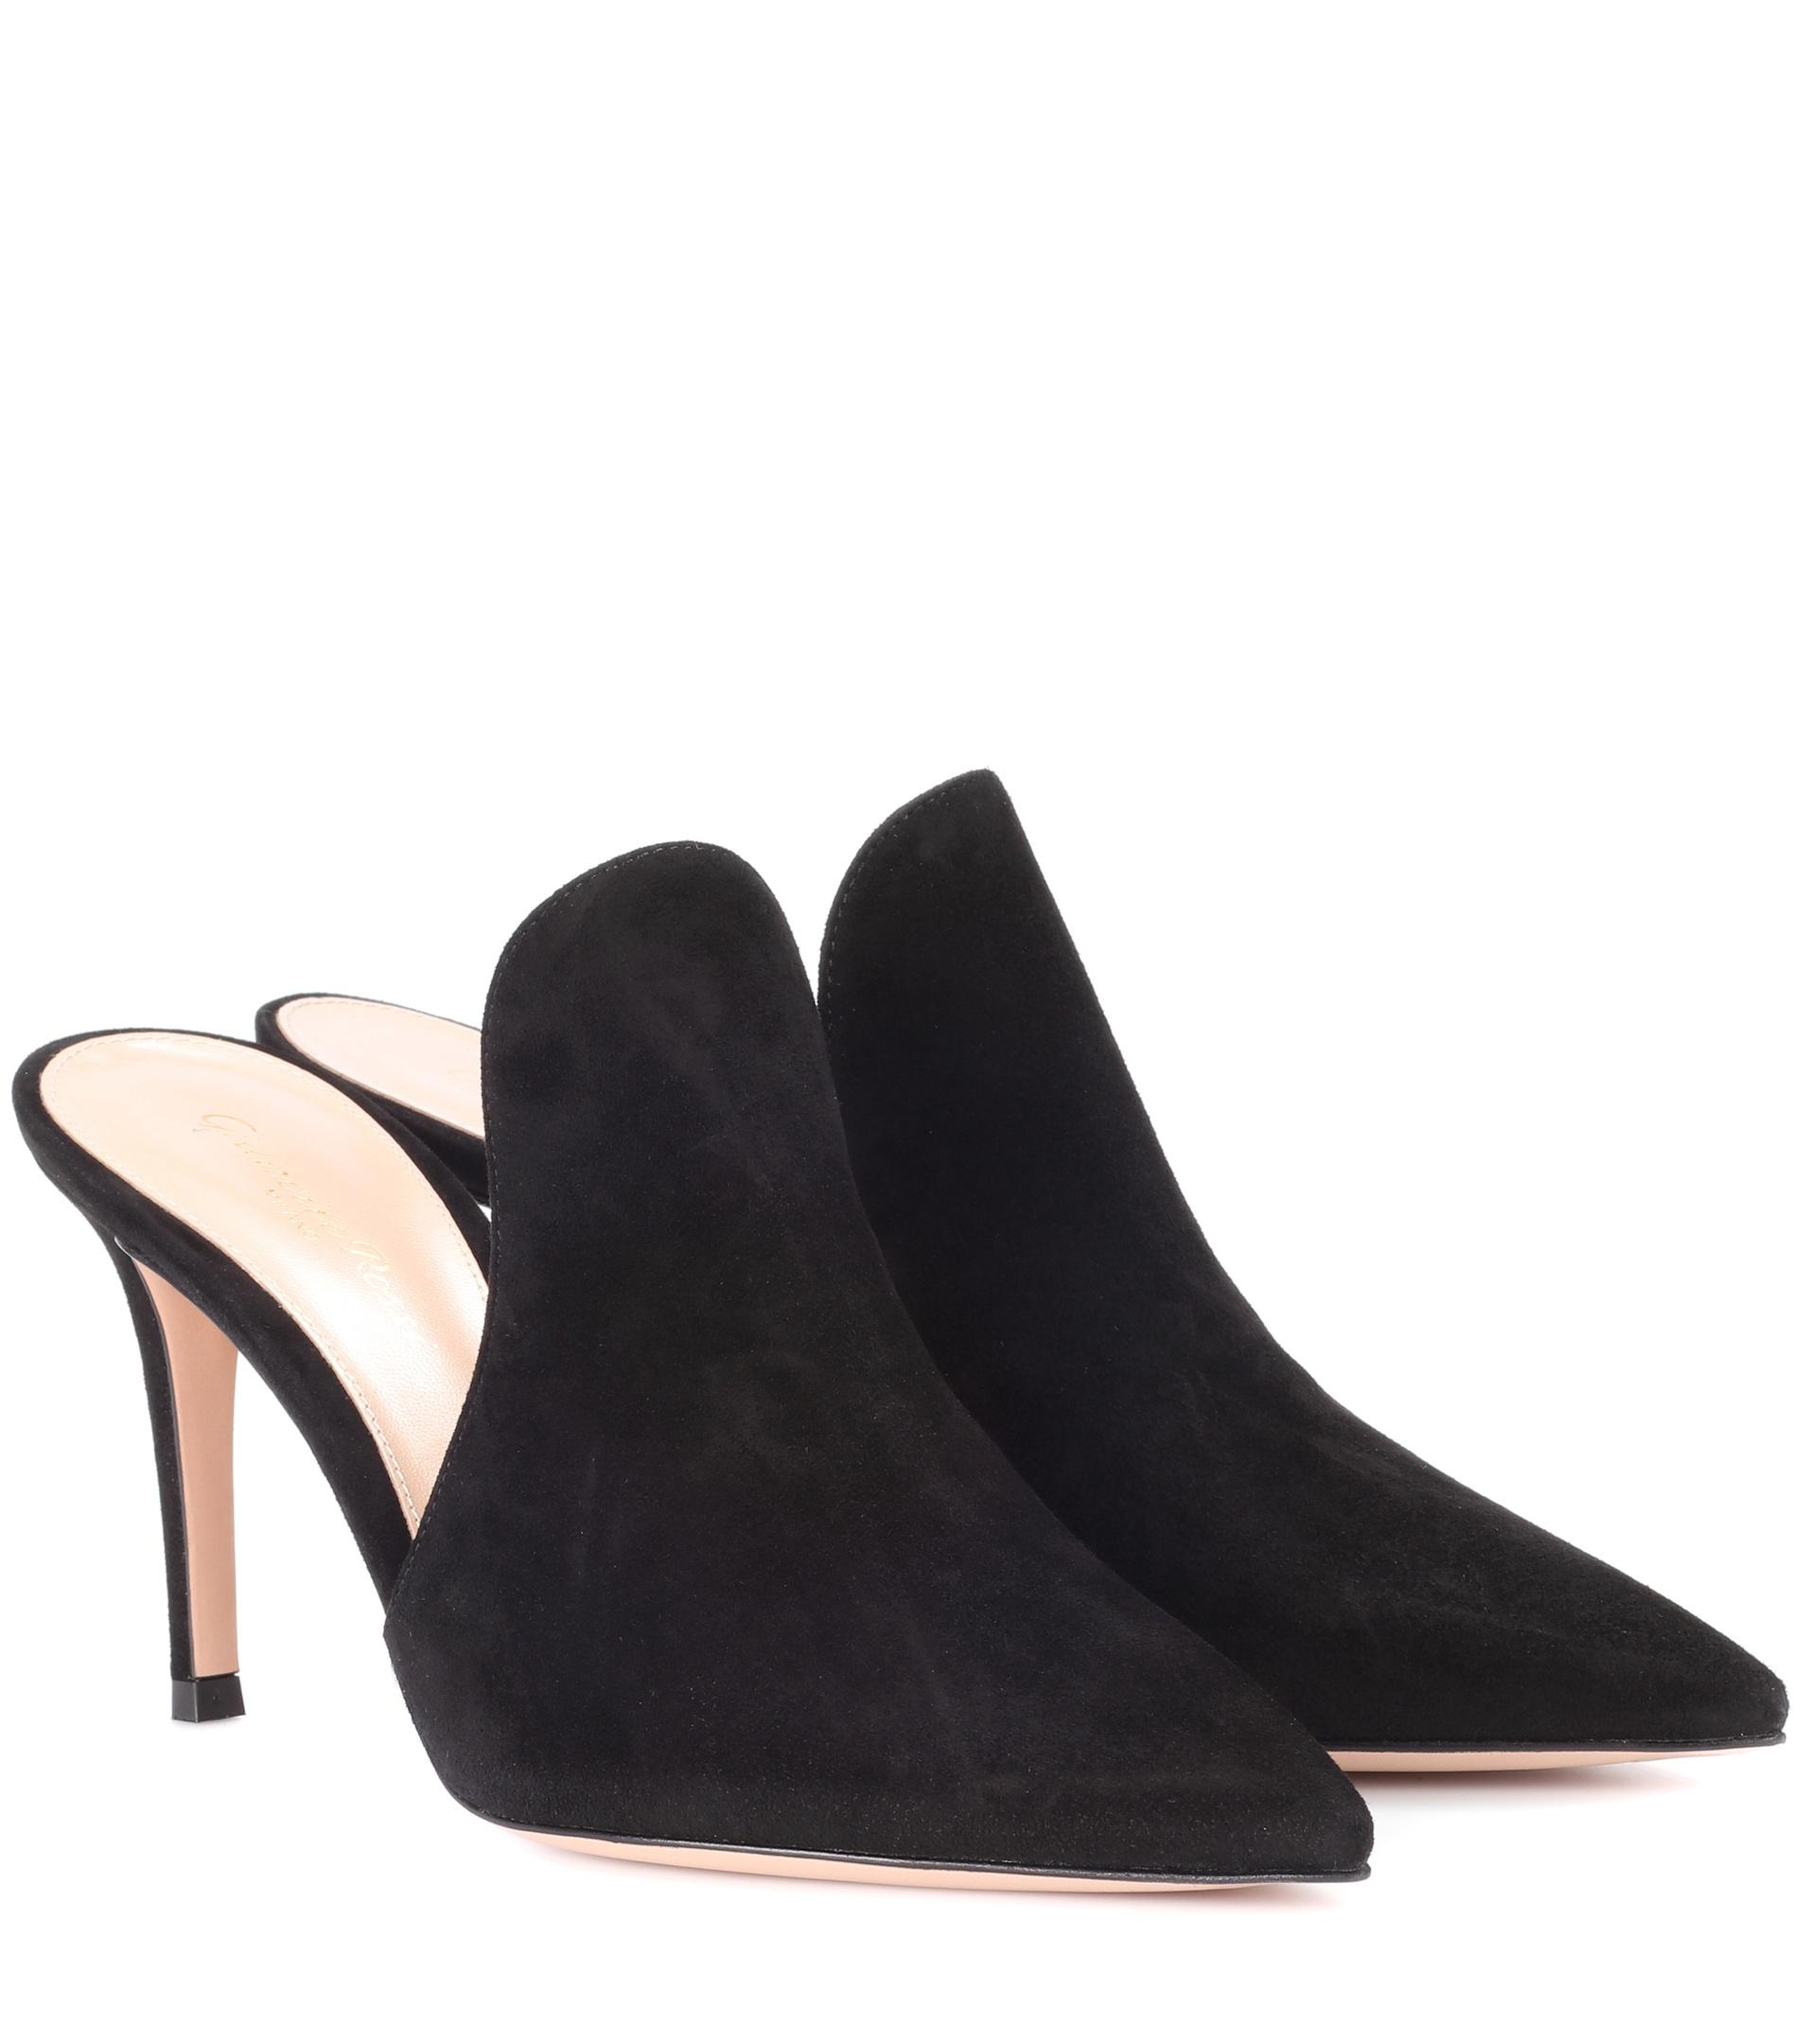 a8391899c48 Lyst - Gianvito Rossi Aramis 105 Black Suede Mules in Black - Save 65%